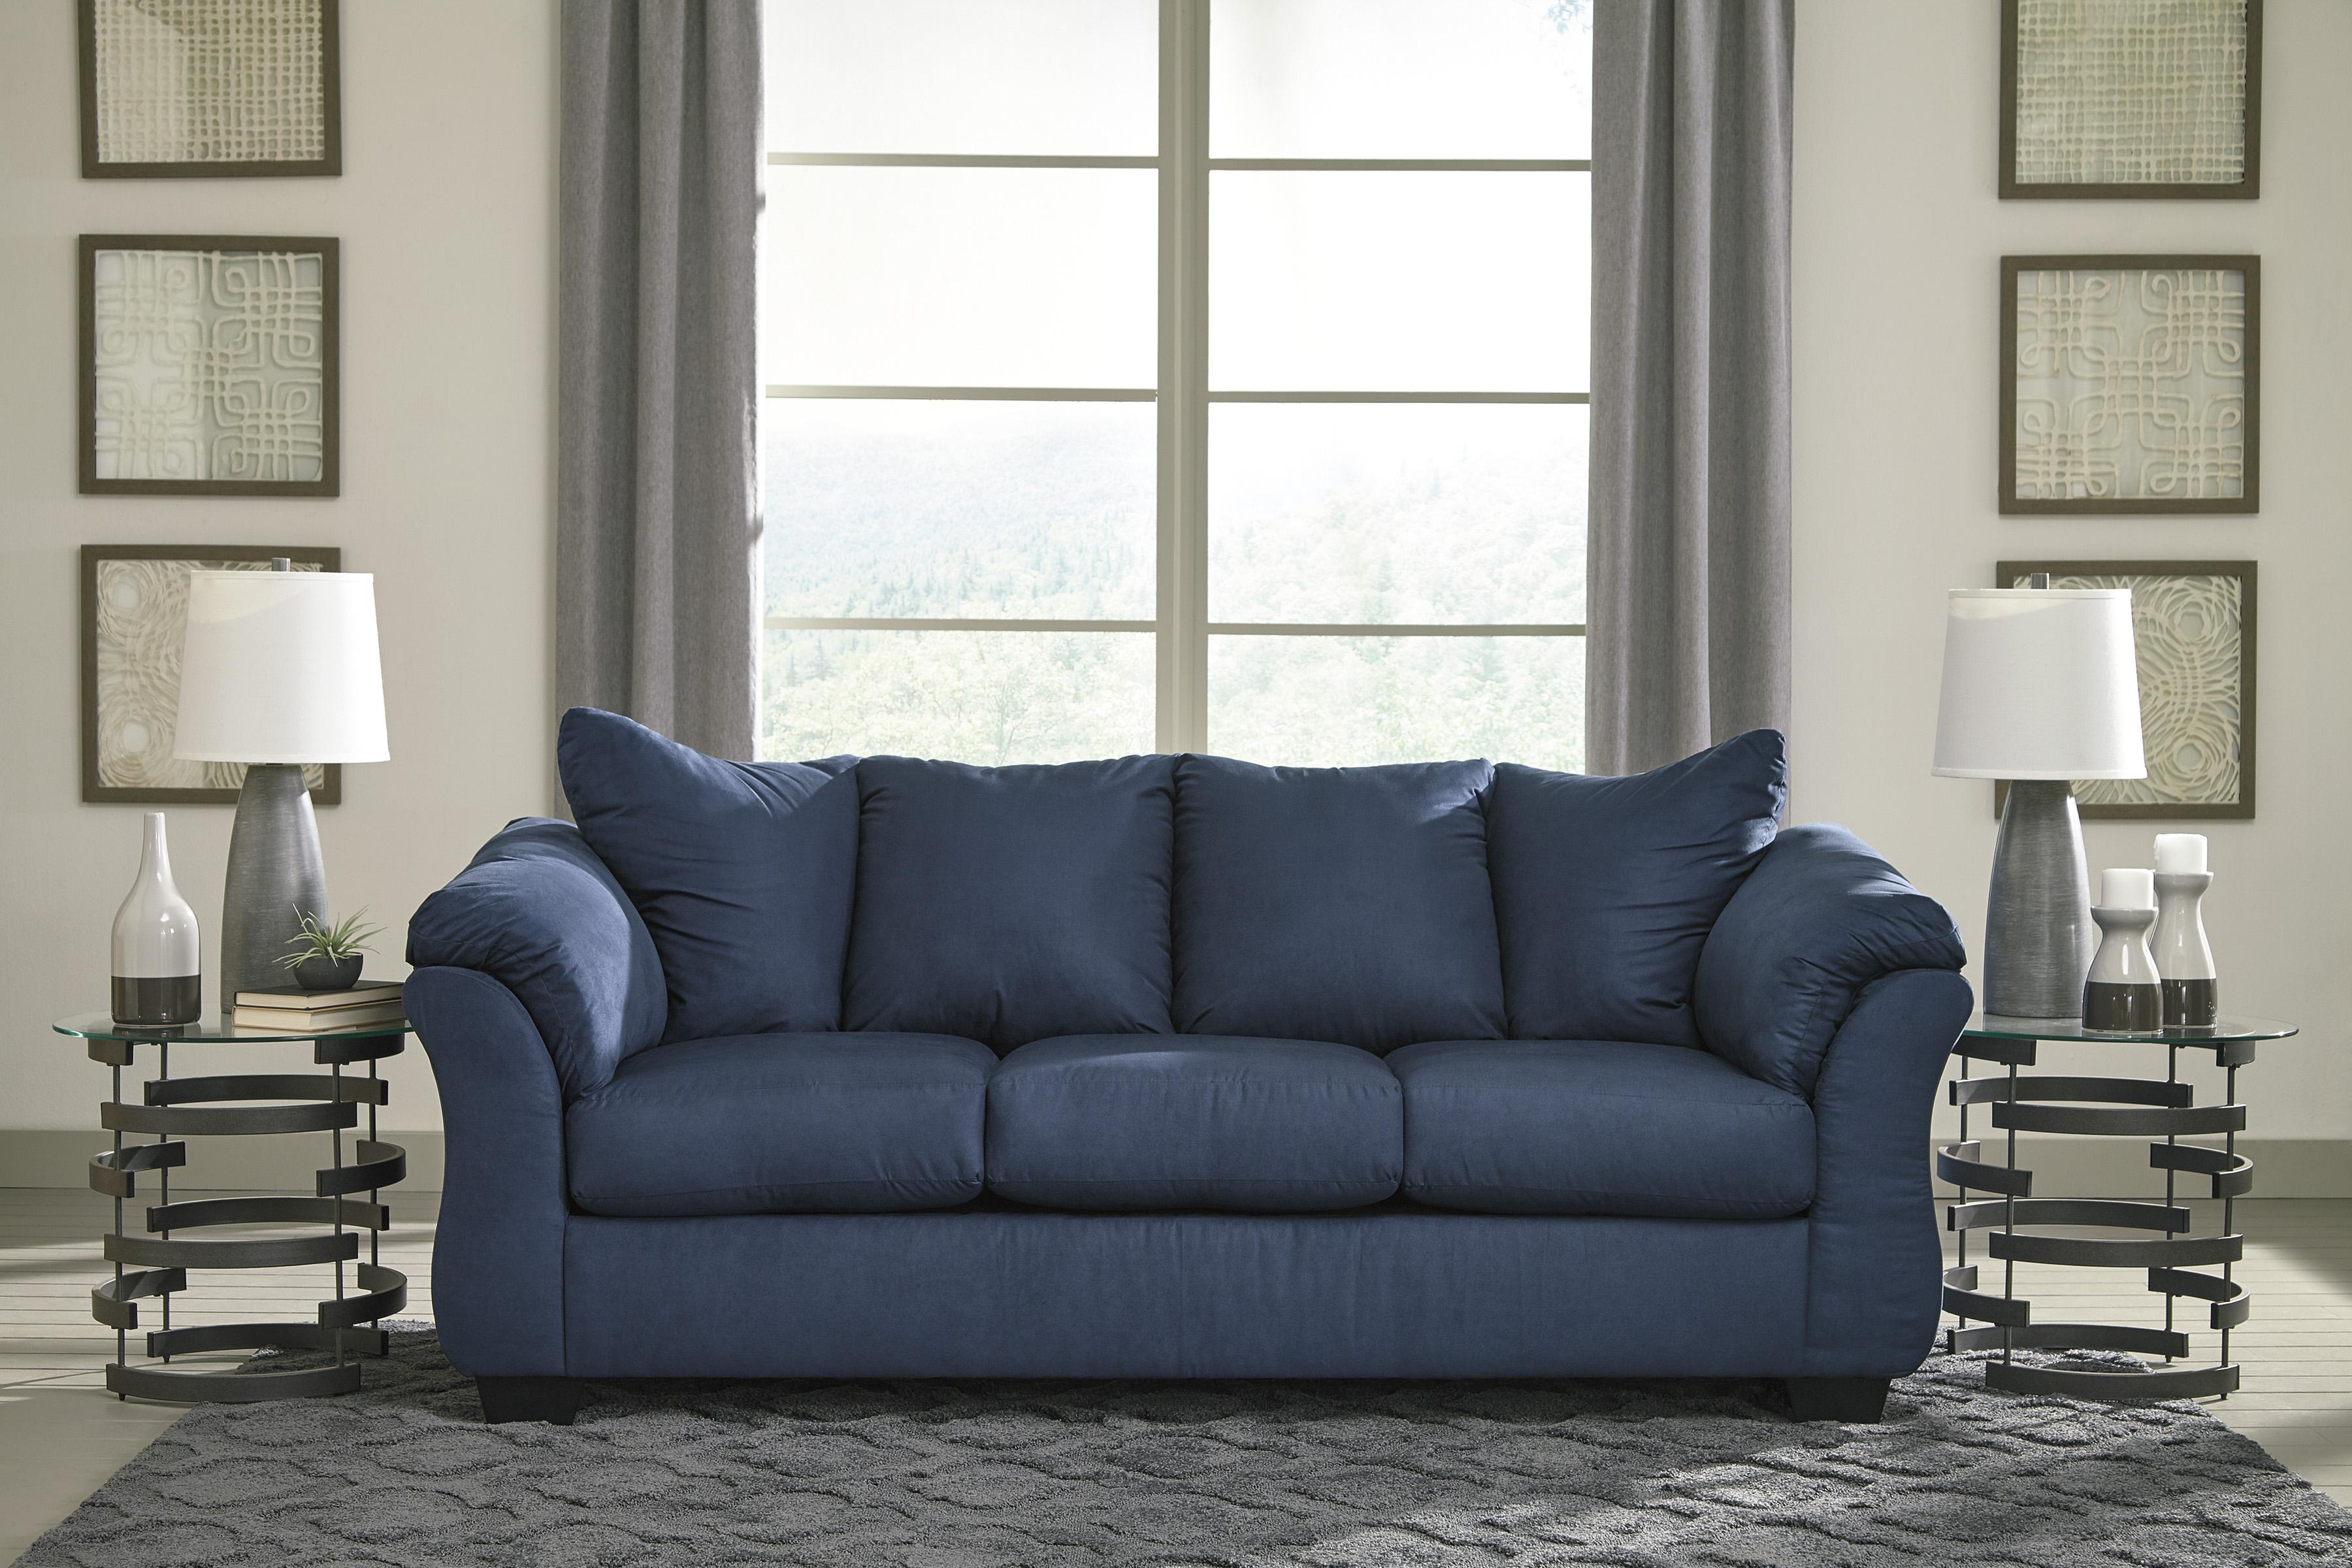 Darcy Blue Sofa Loveseat Set Marjen Of Chicago Chicago  ~ Blue Sofa And Loveseat Sets